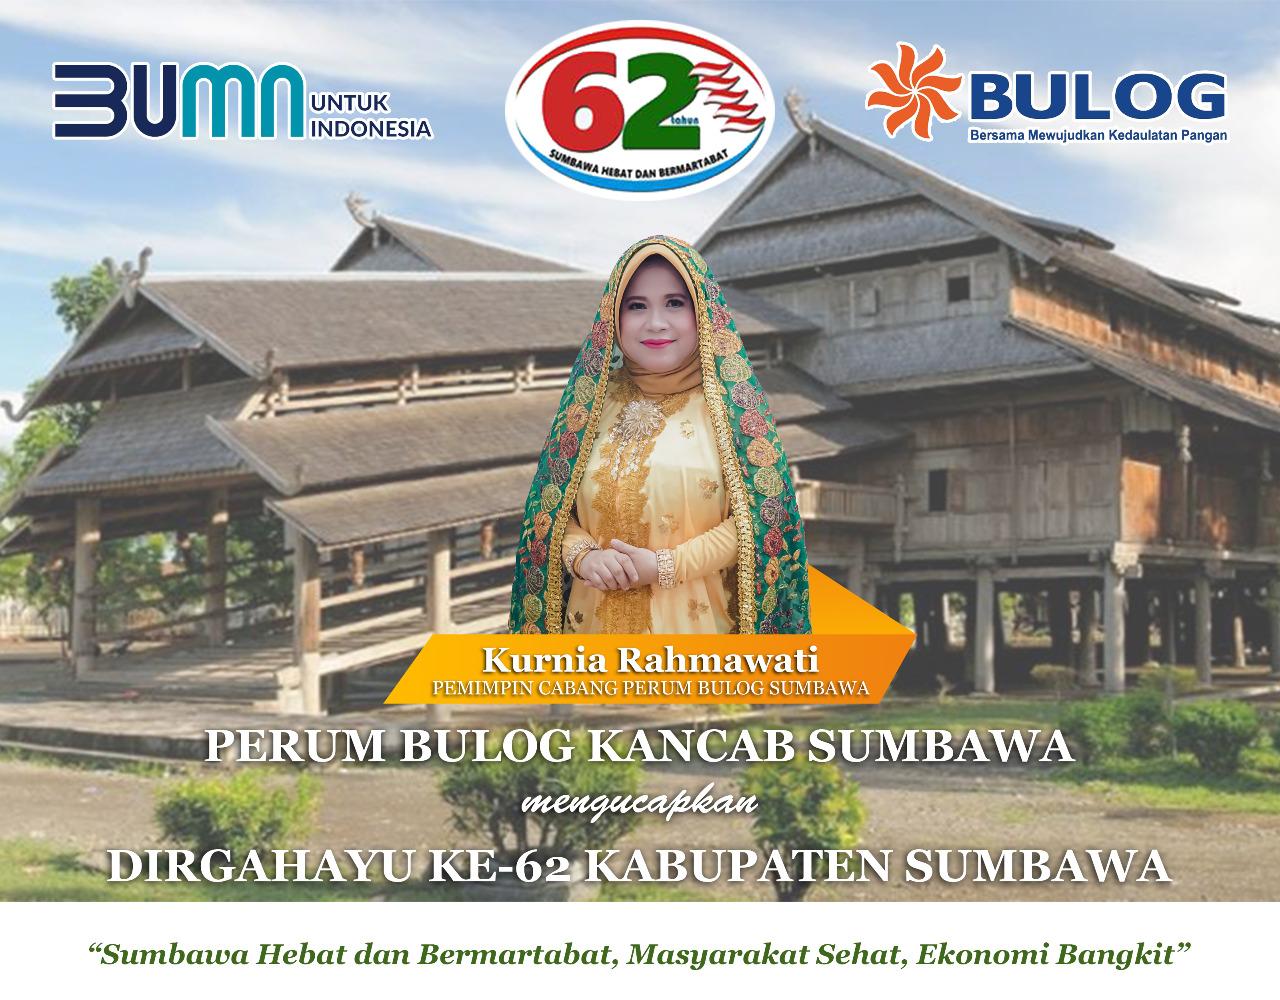 Keluarga Besar Perum Bulog Kantor Cabang (Kancab) Sumbawa Mengucapkan Dirgahayu Ke-62 Kabupaten Sumbawa